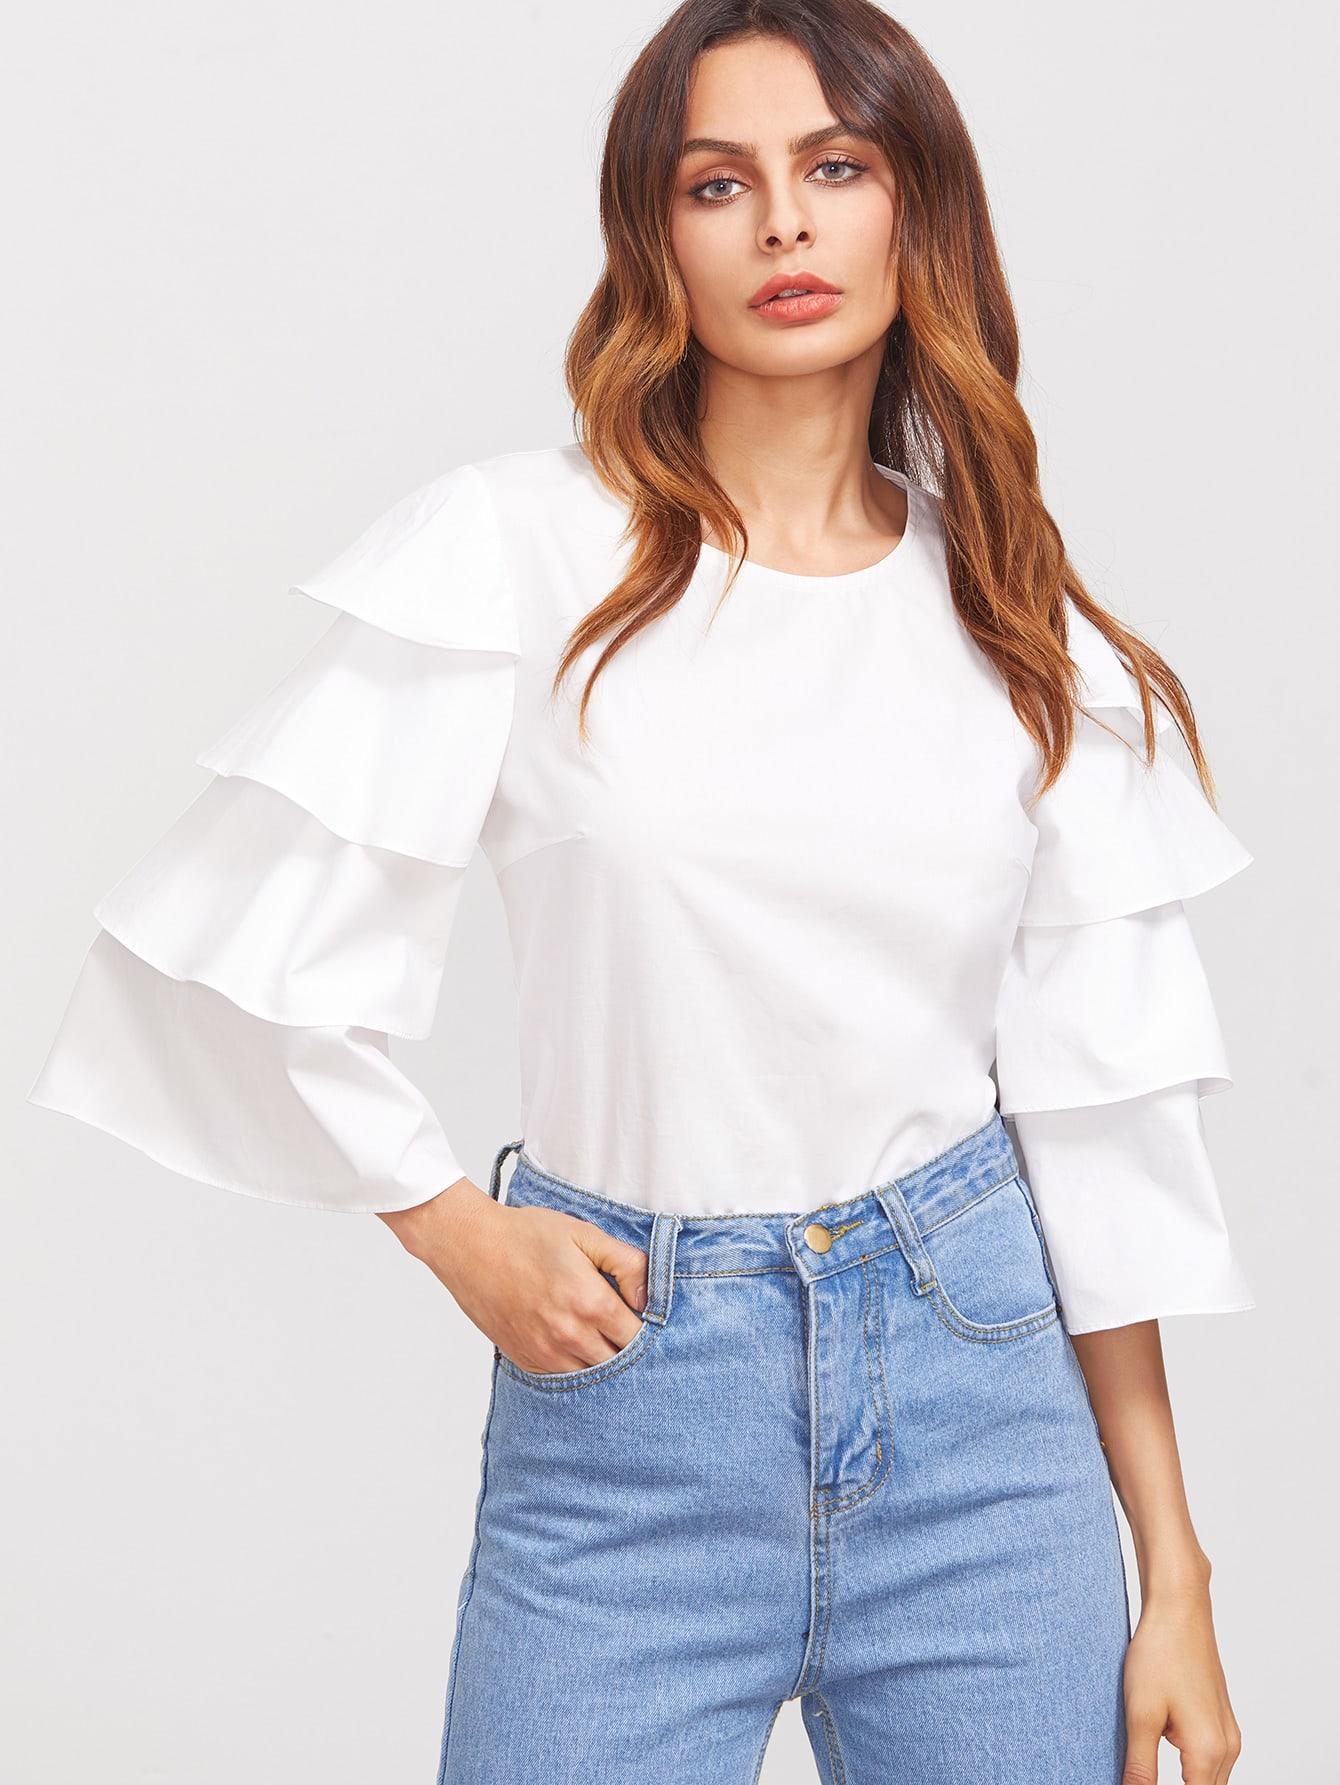 blouse170102702_2